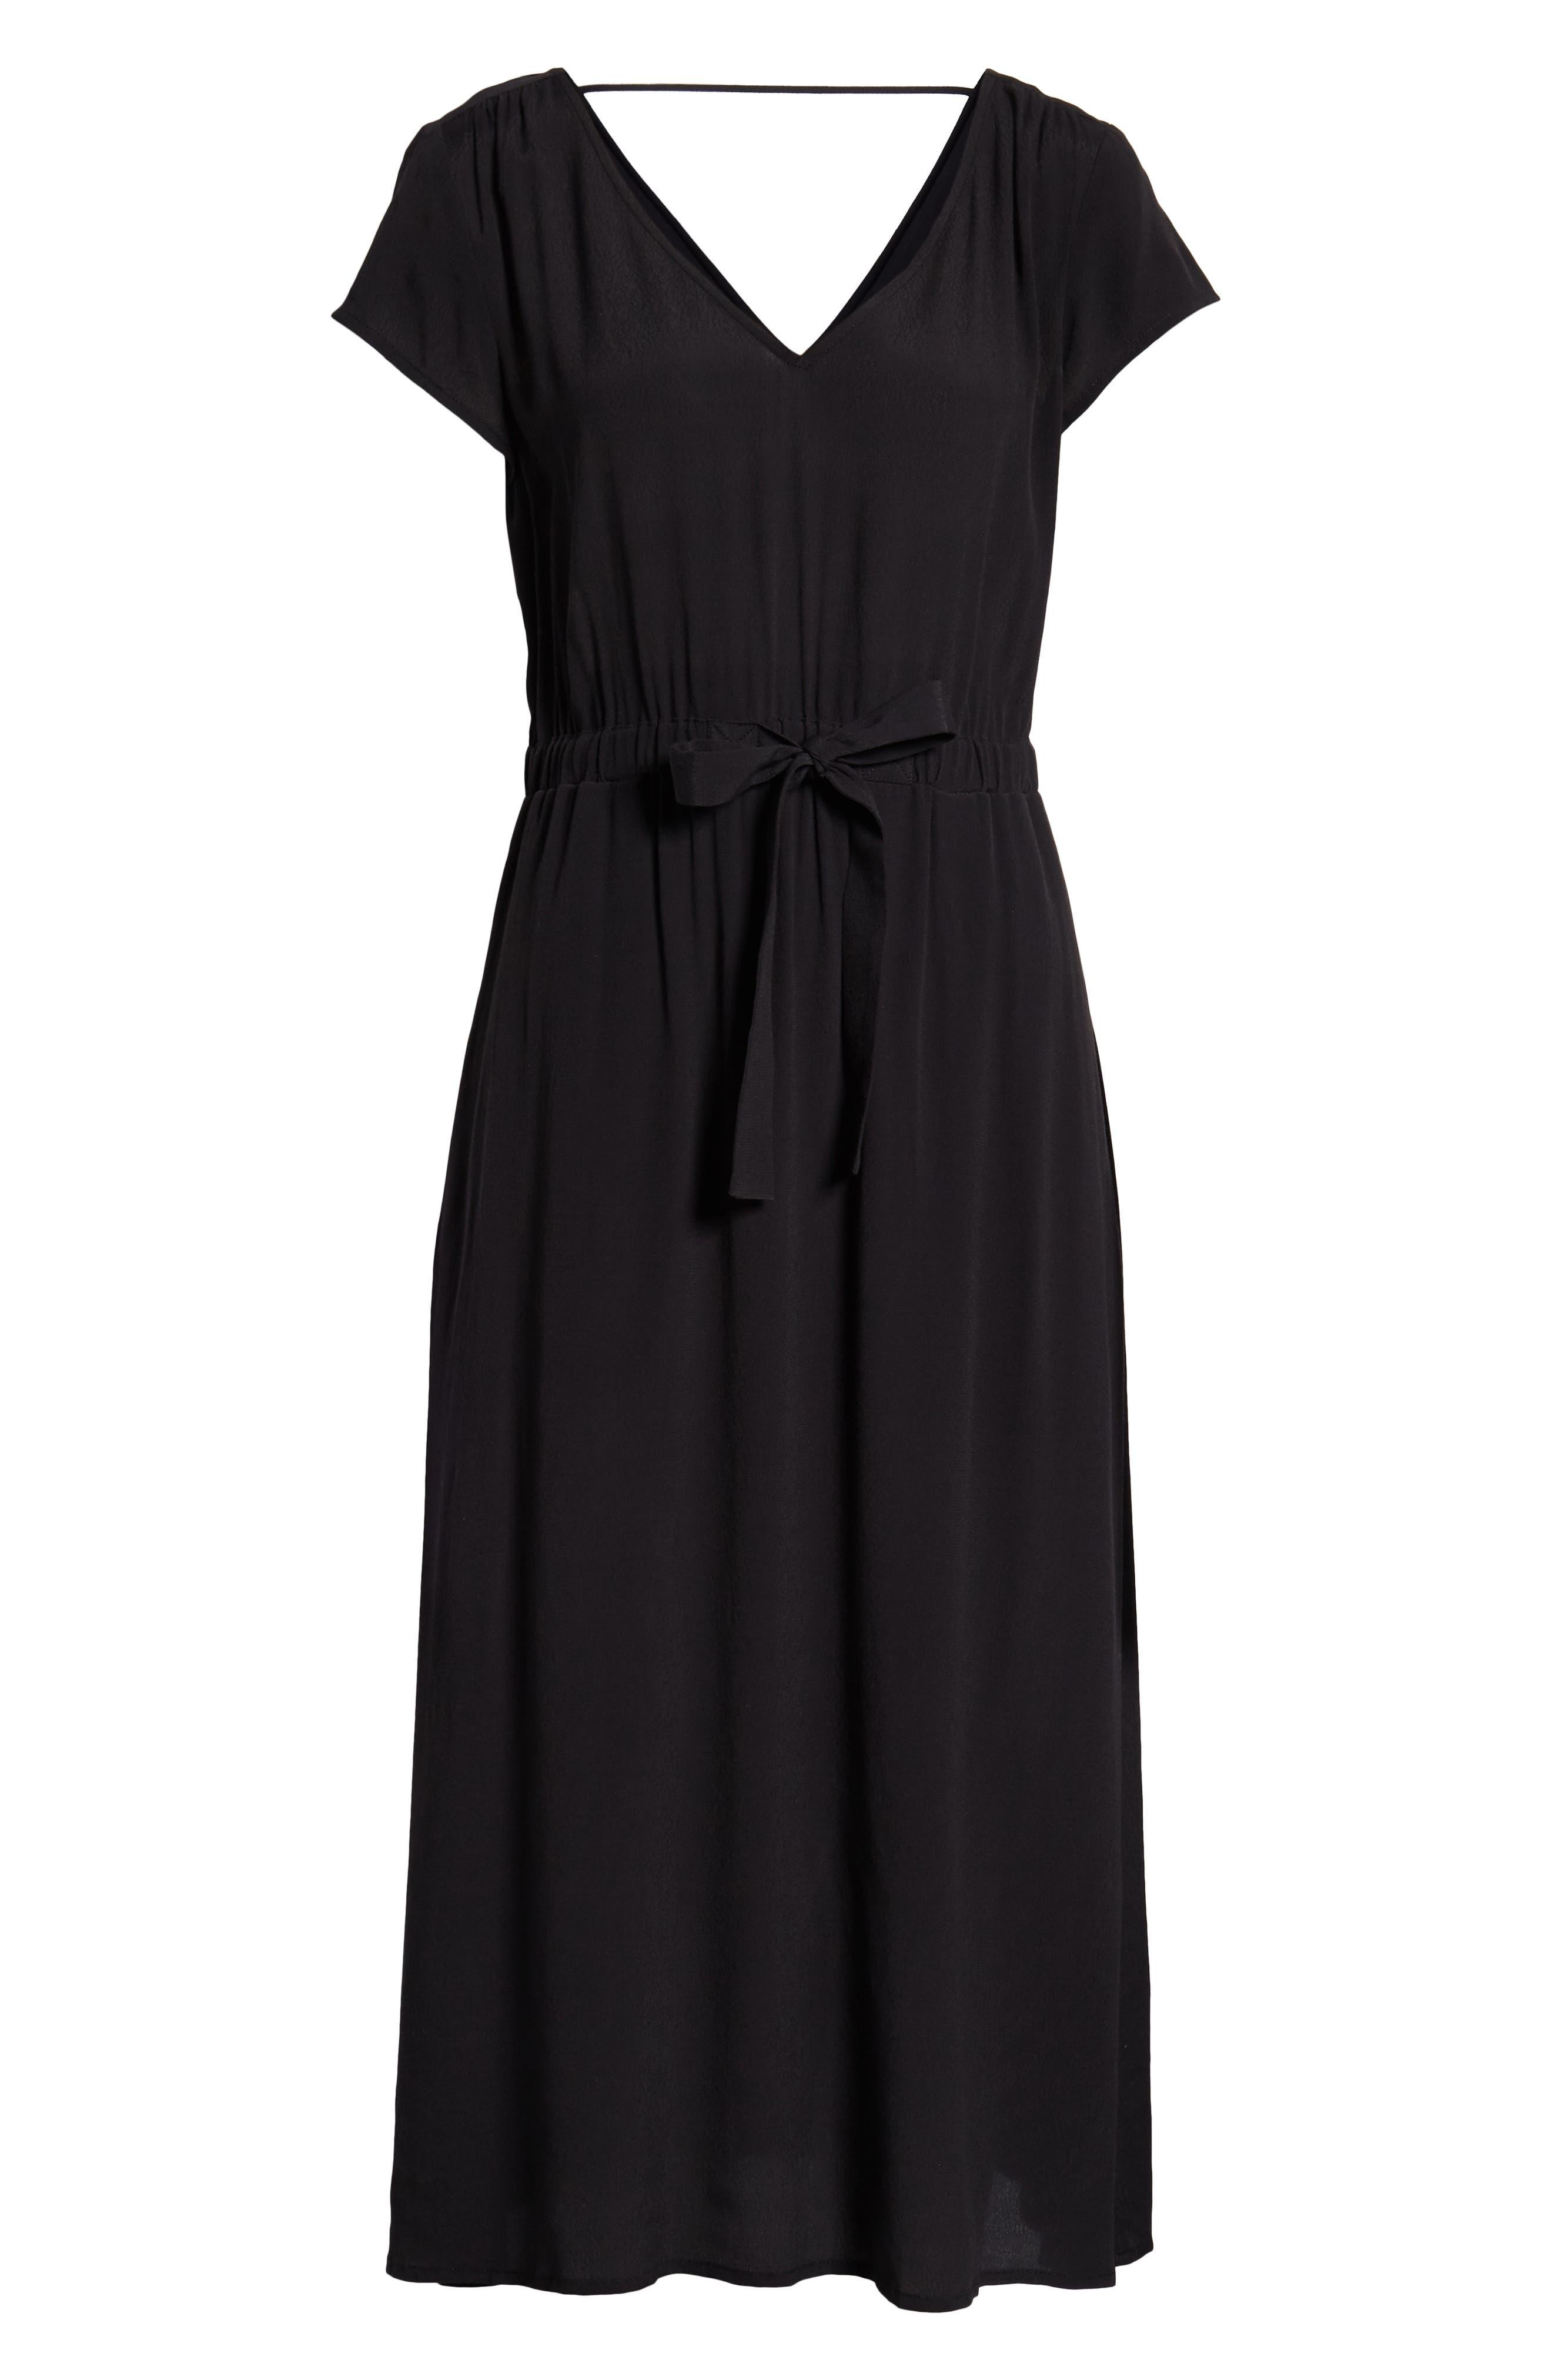 TREASURE & BOND, Cap Sleeve Midi Dress, Alternate thumbnail 7, color, BLACK